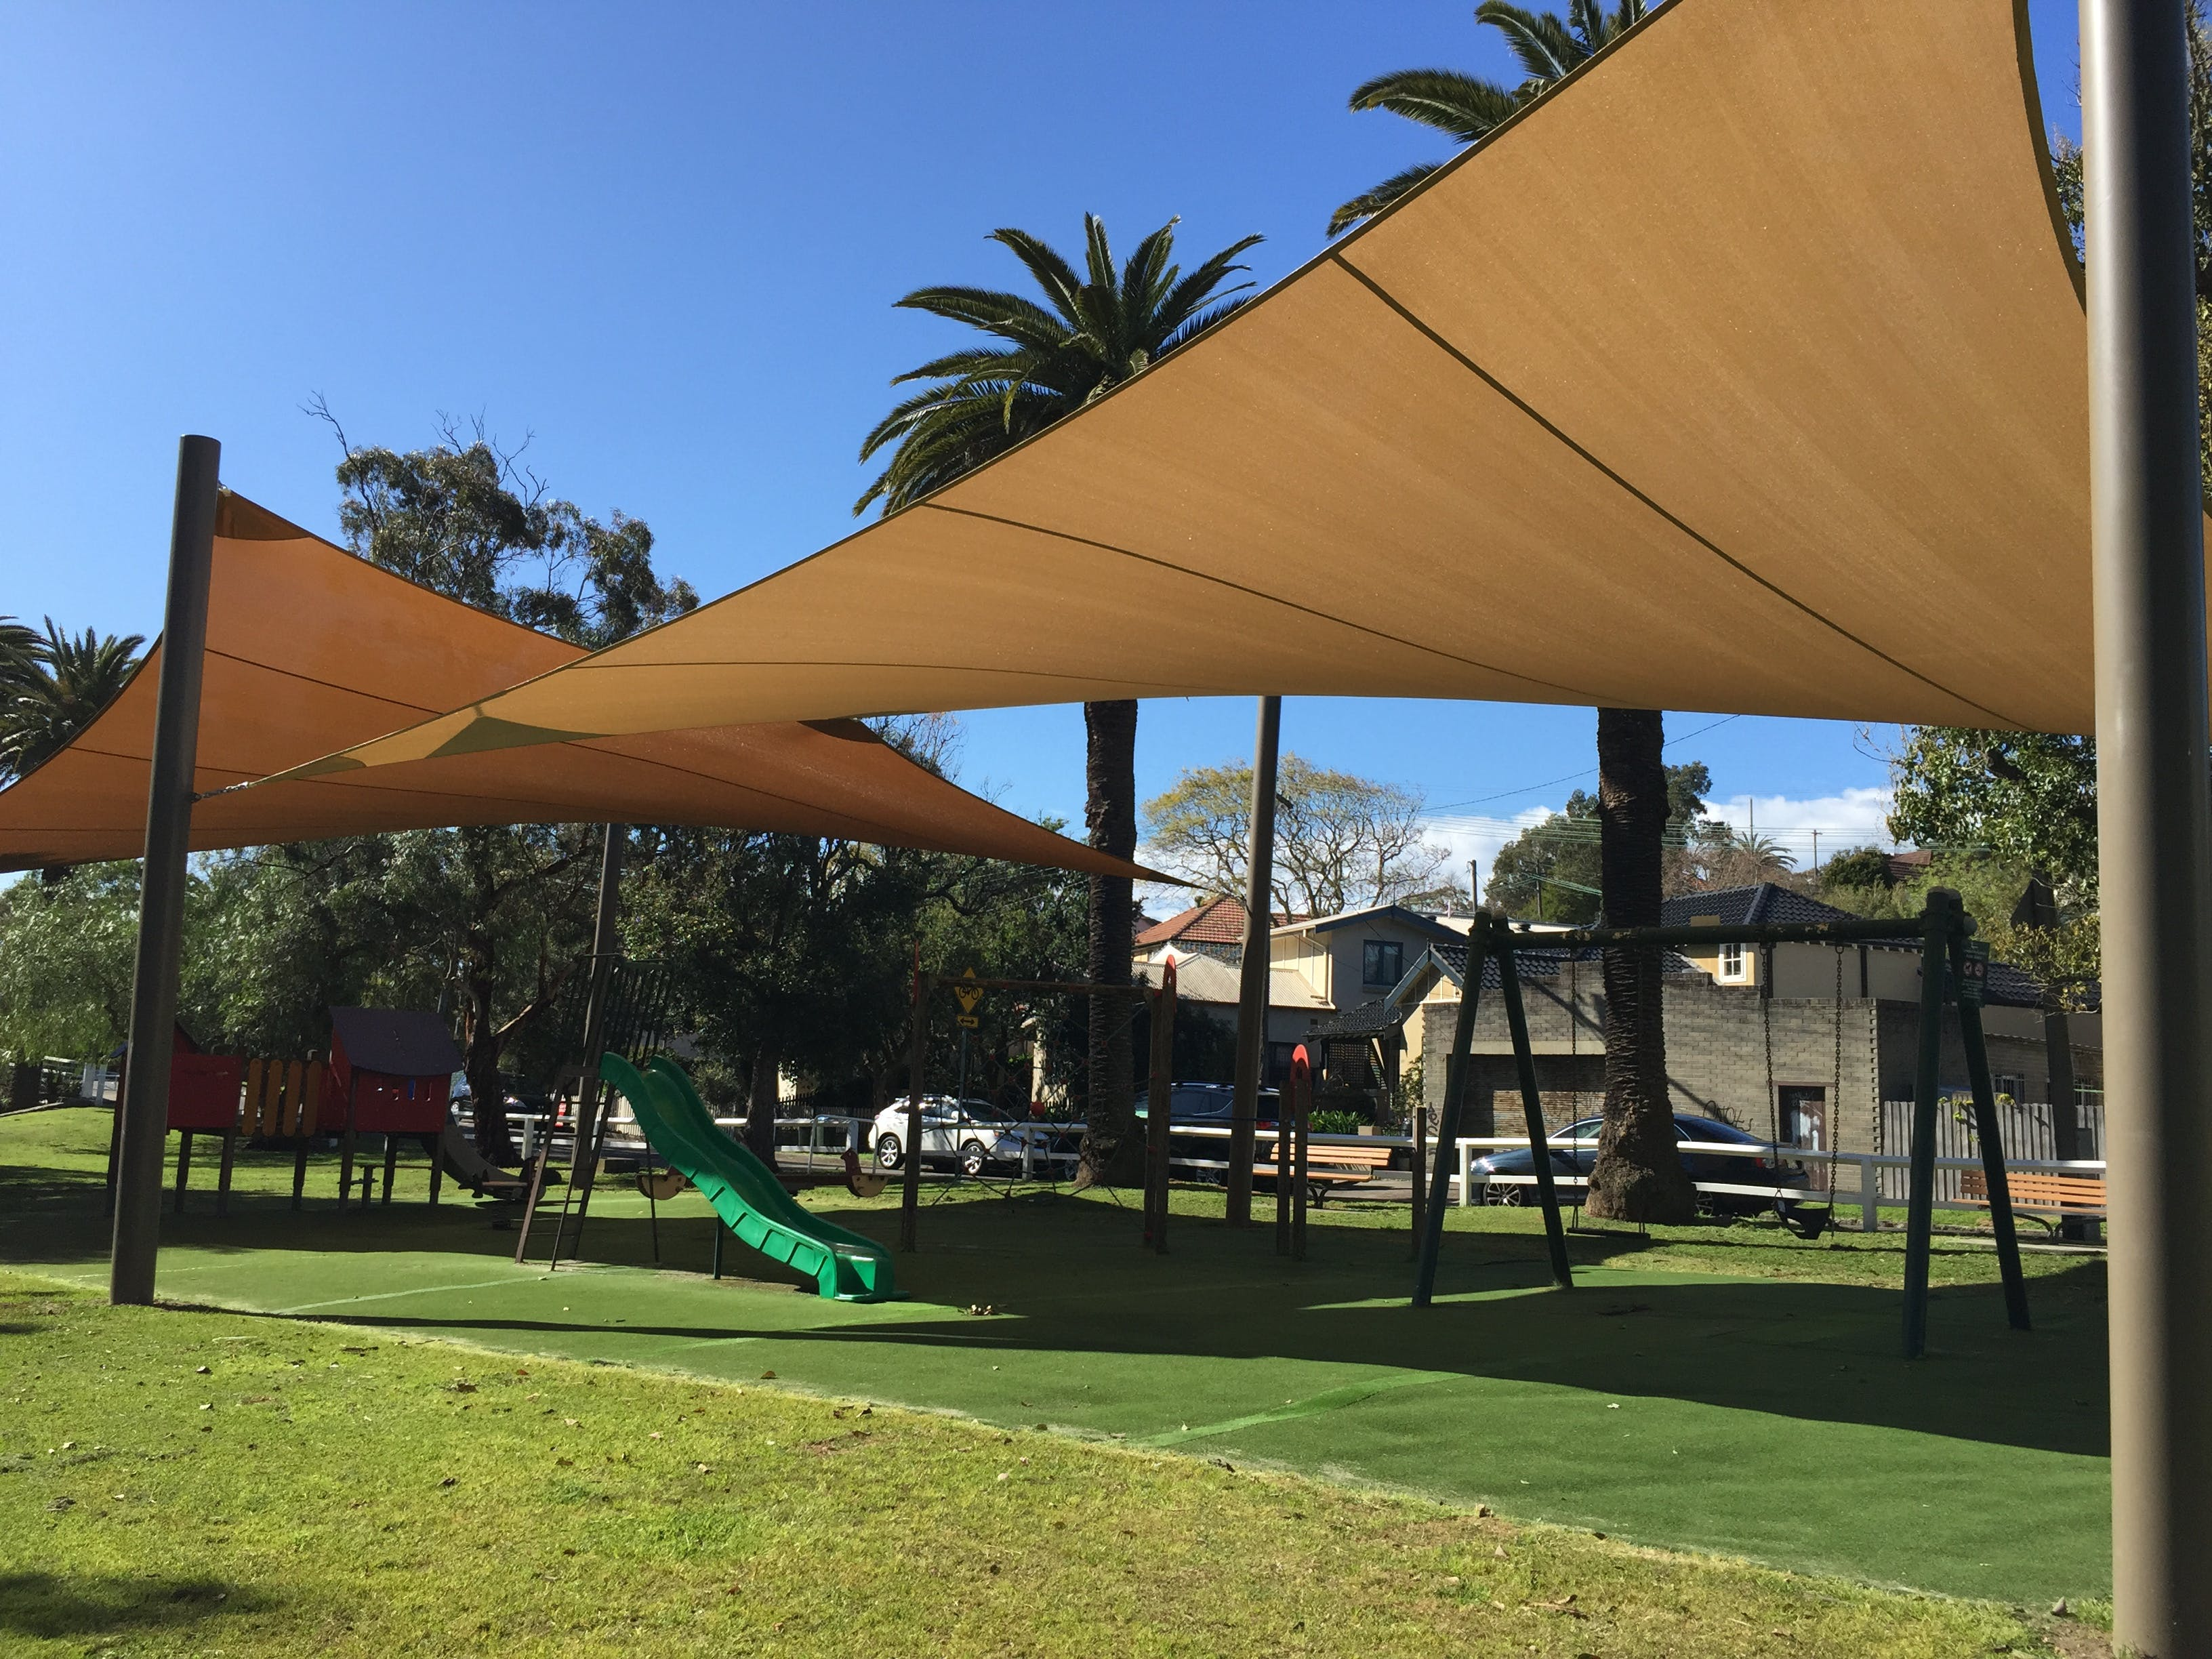 Whites Creek Valley Park Playground